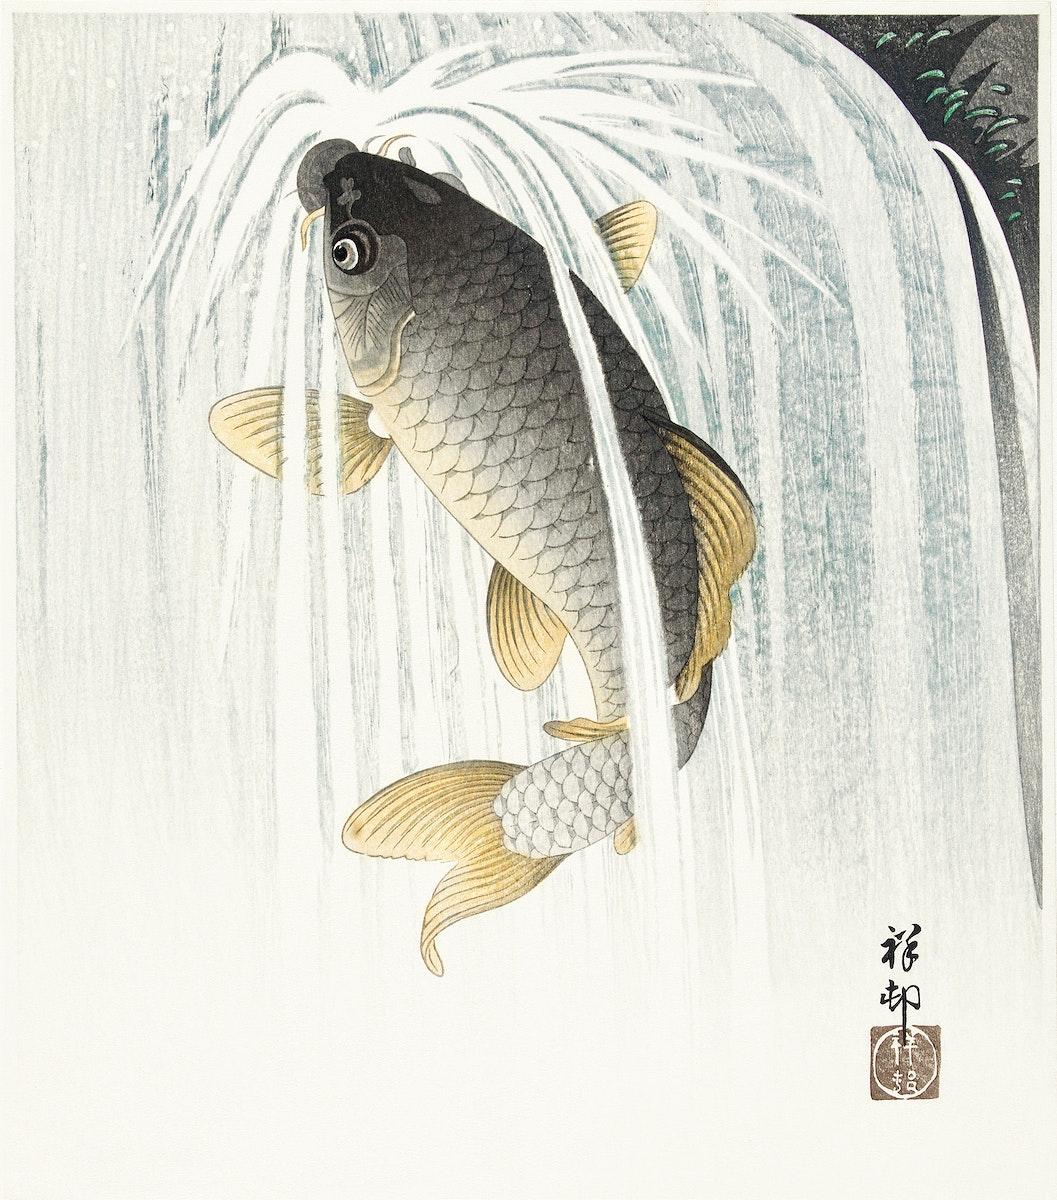 Carp (1935) by Ohara Koson (1877-1945). Original from The Rijksmuseum. Digitally enhanced by rawpixel.